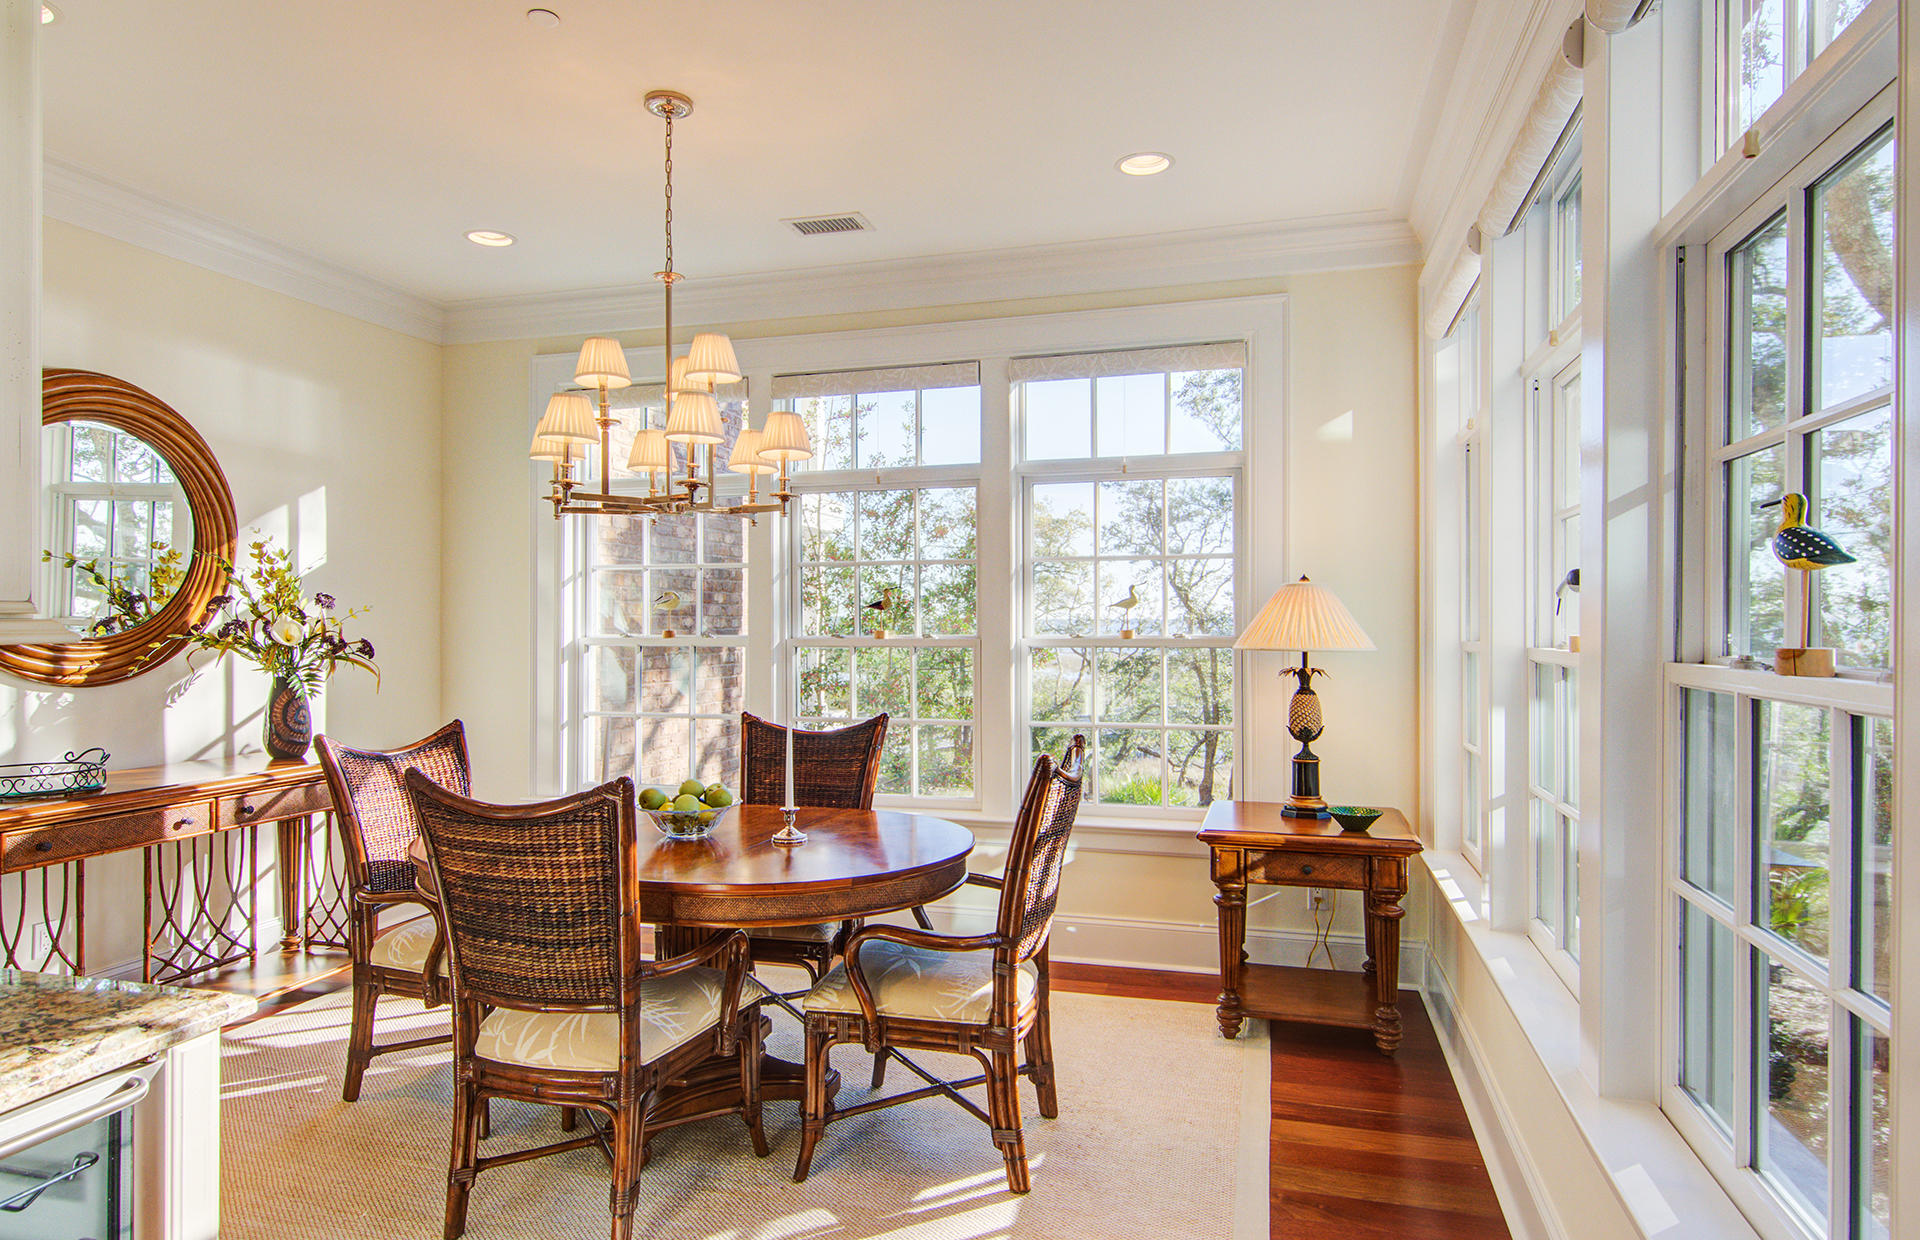 Daniel Island Homes For Sale - 134 Fairbanks Oak, Charleston, SC - 51